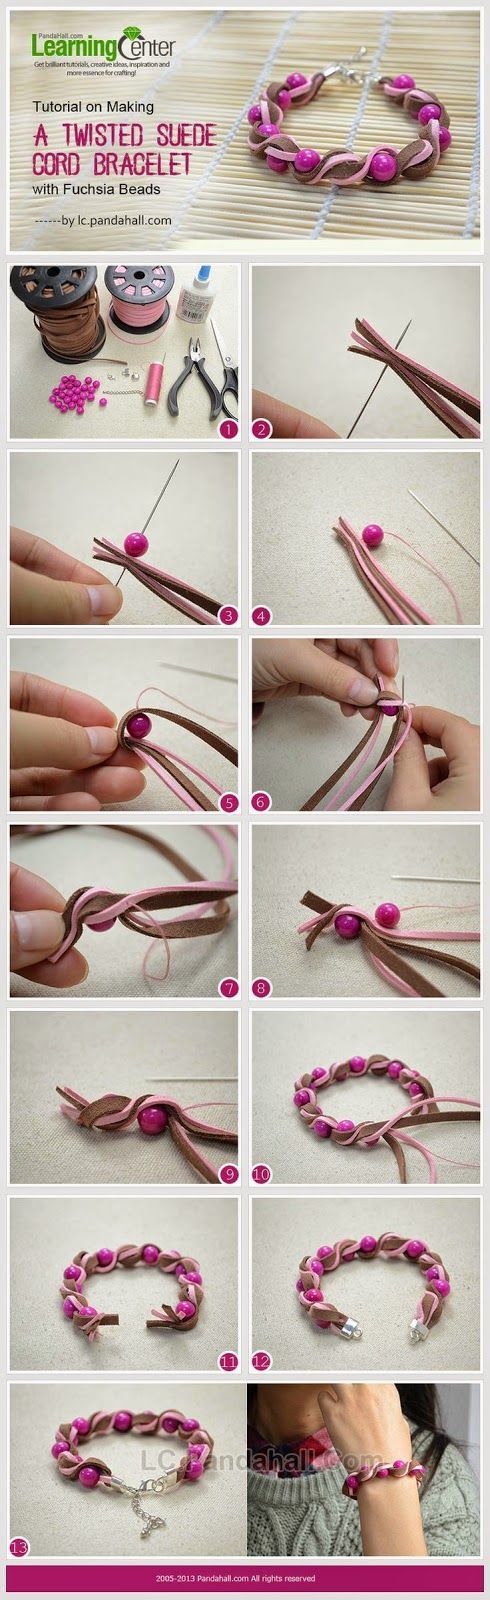 Twisted Suede Cord Bracelet with Fuchsia Beads  Gunadesign Handmade Jewelry and Fashion Barn